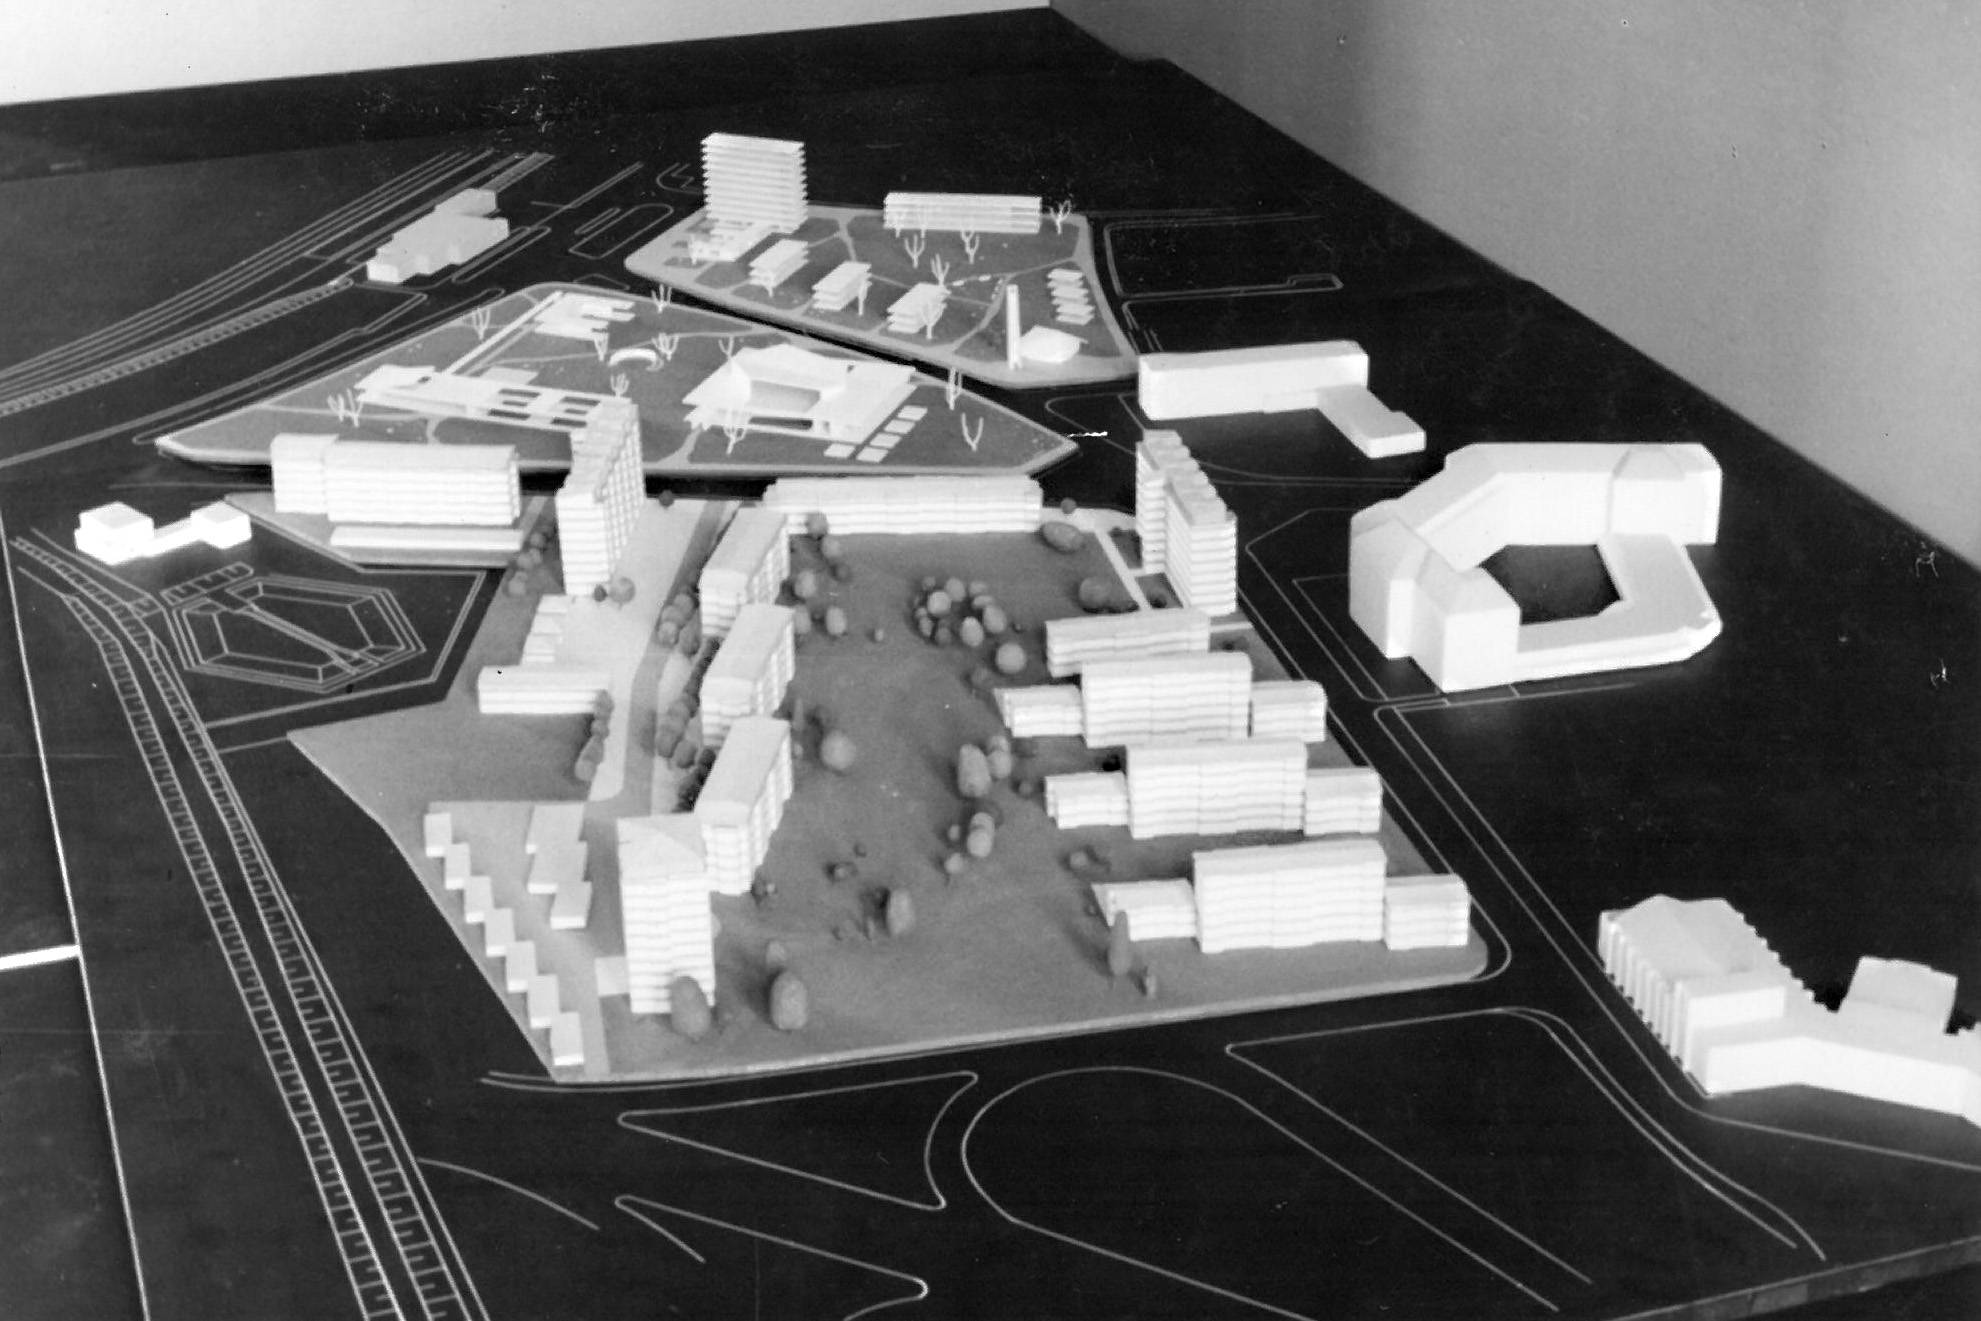 Zinkhüttensiedlung Hamborn Modell